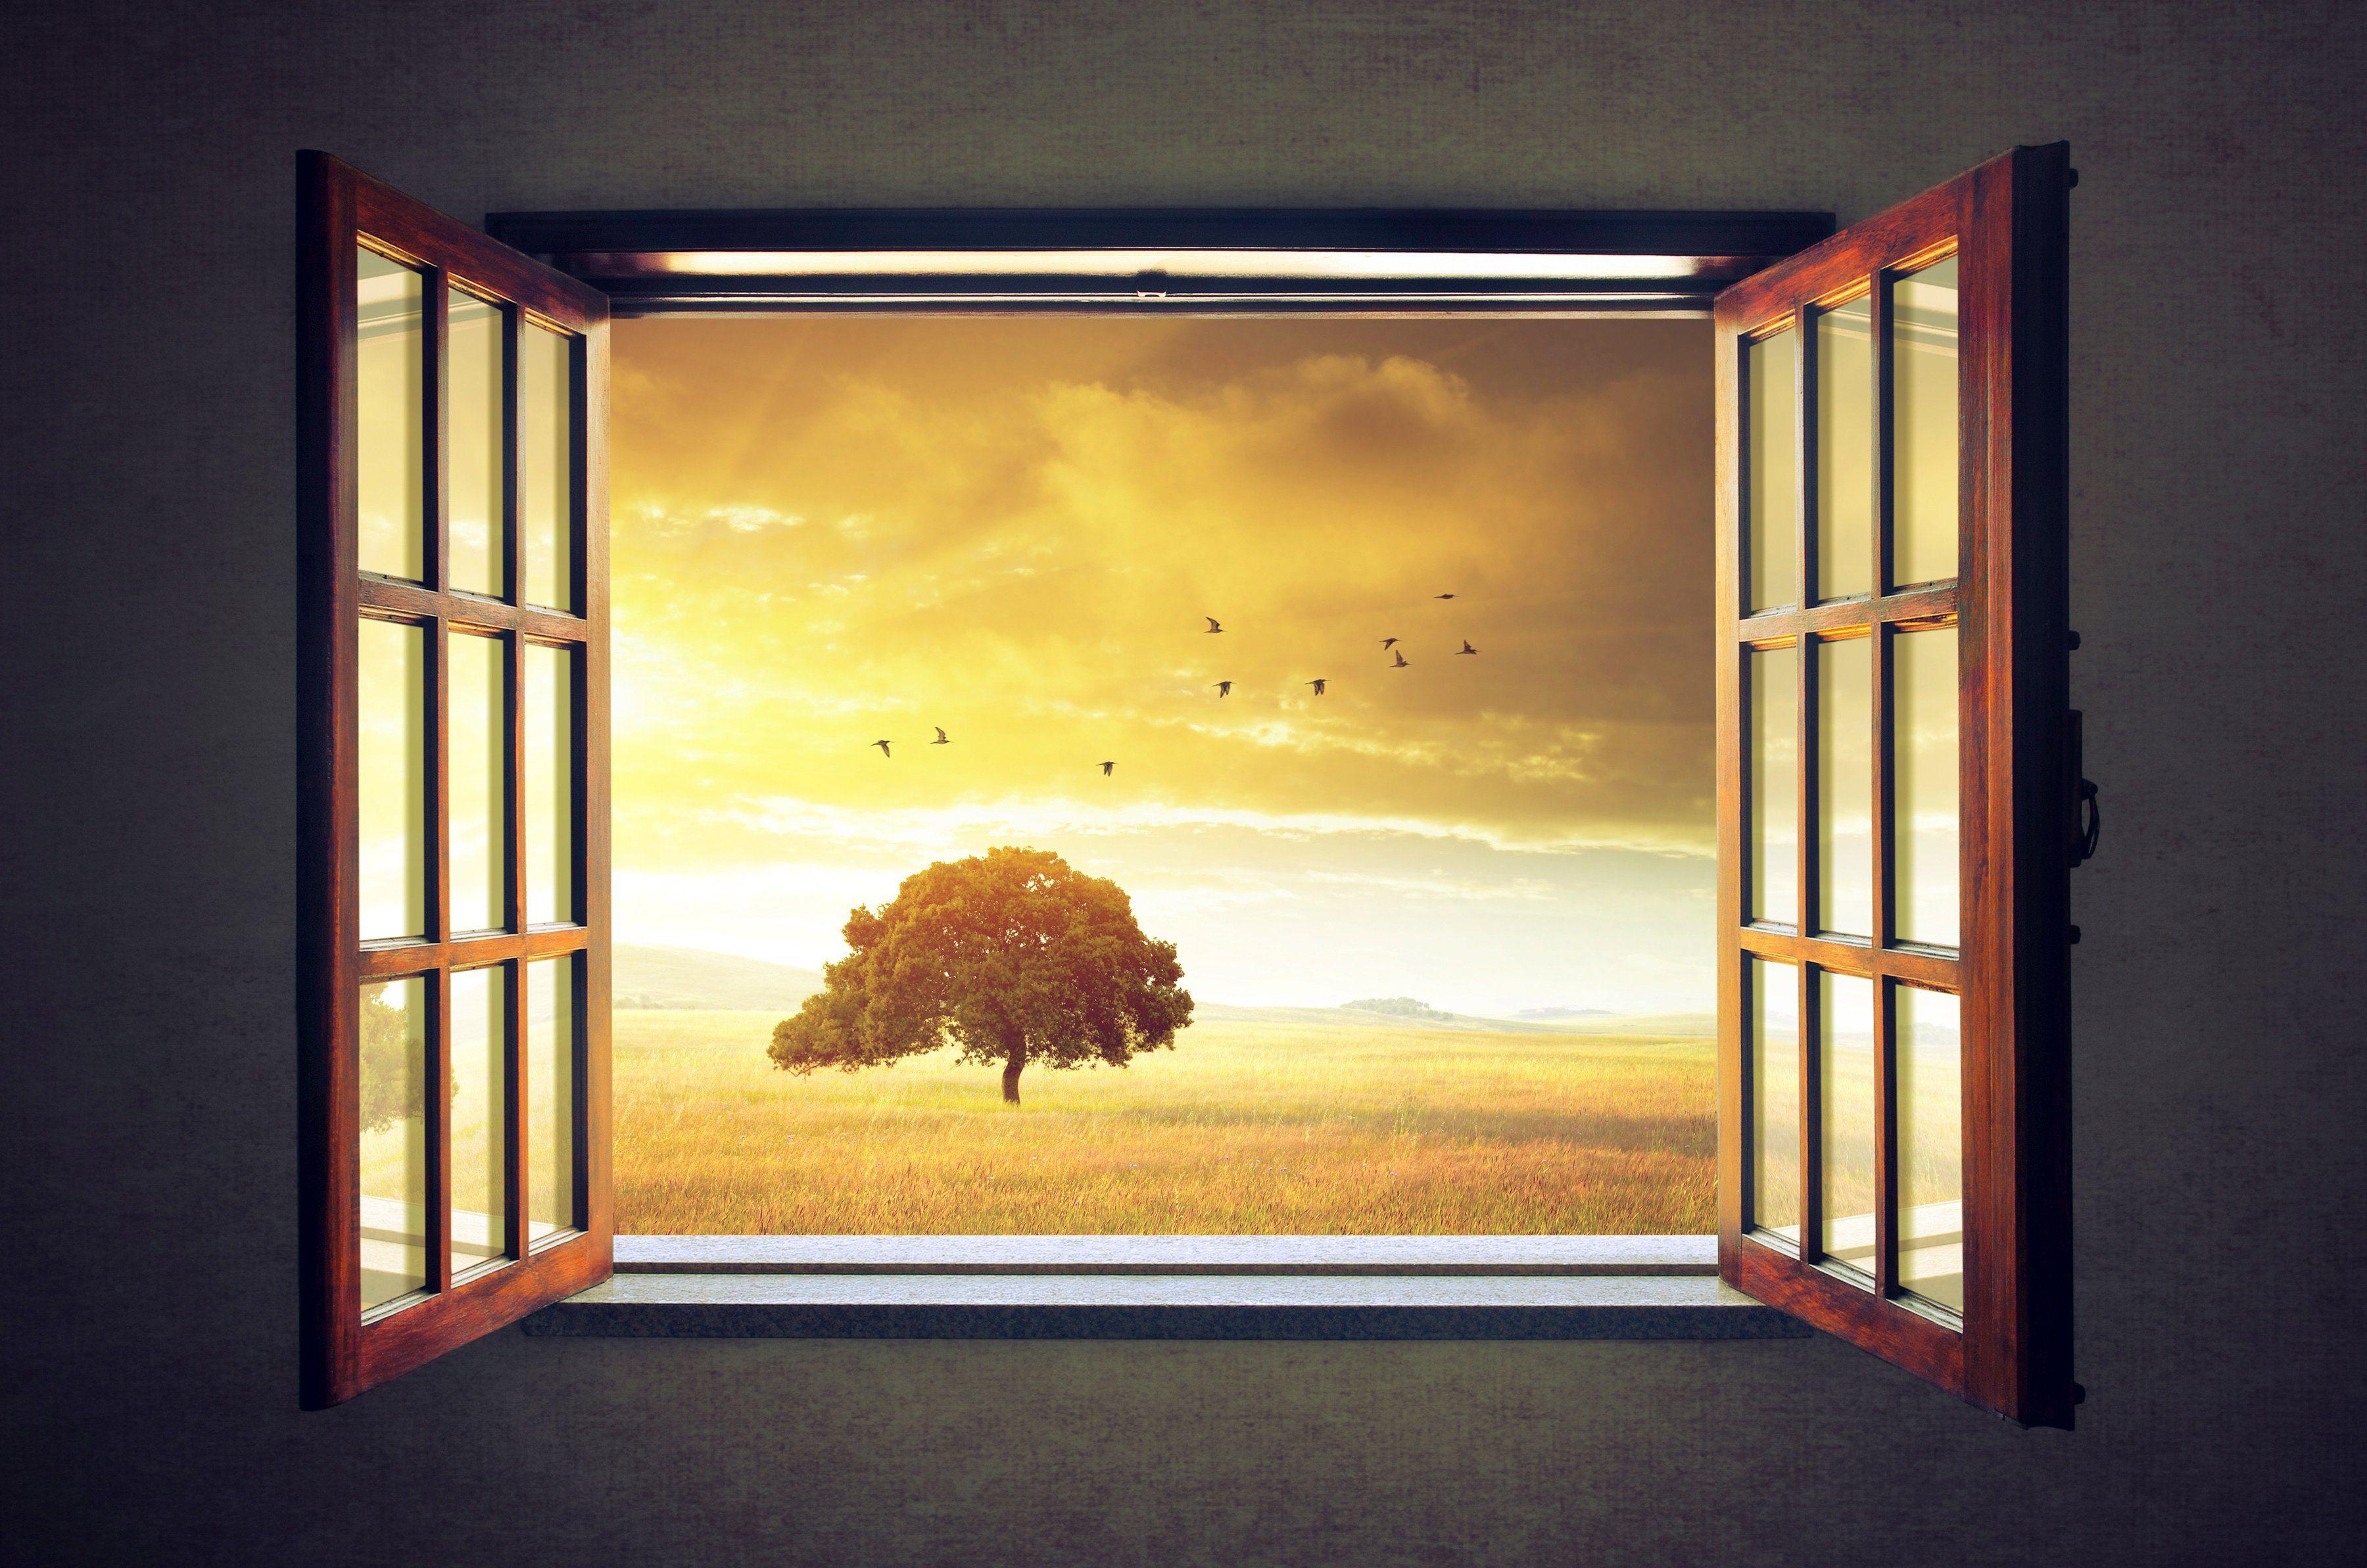 PAPERMOON Fototapete »Sunny Spring«, Vlies, 7 Bahnen, 350 x 260 cm